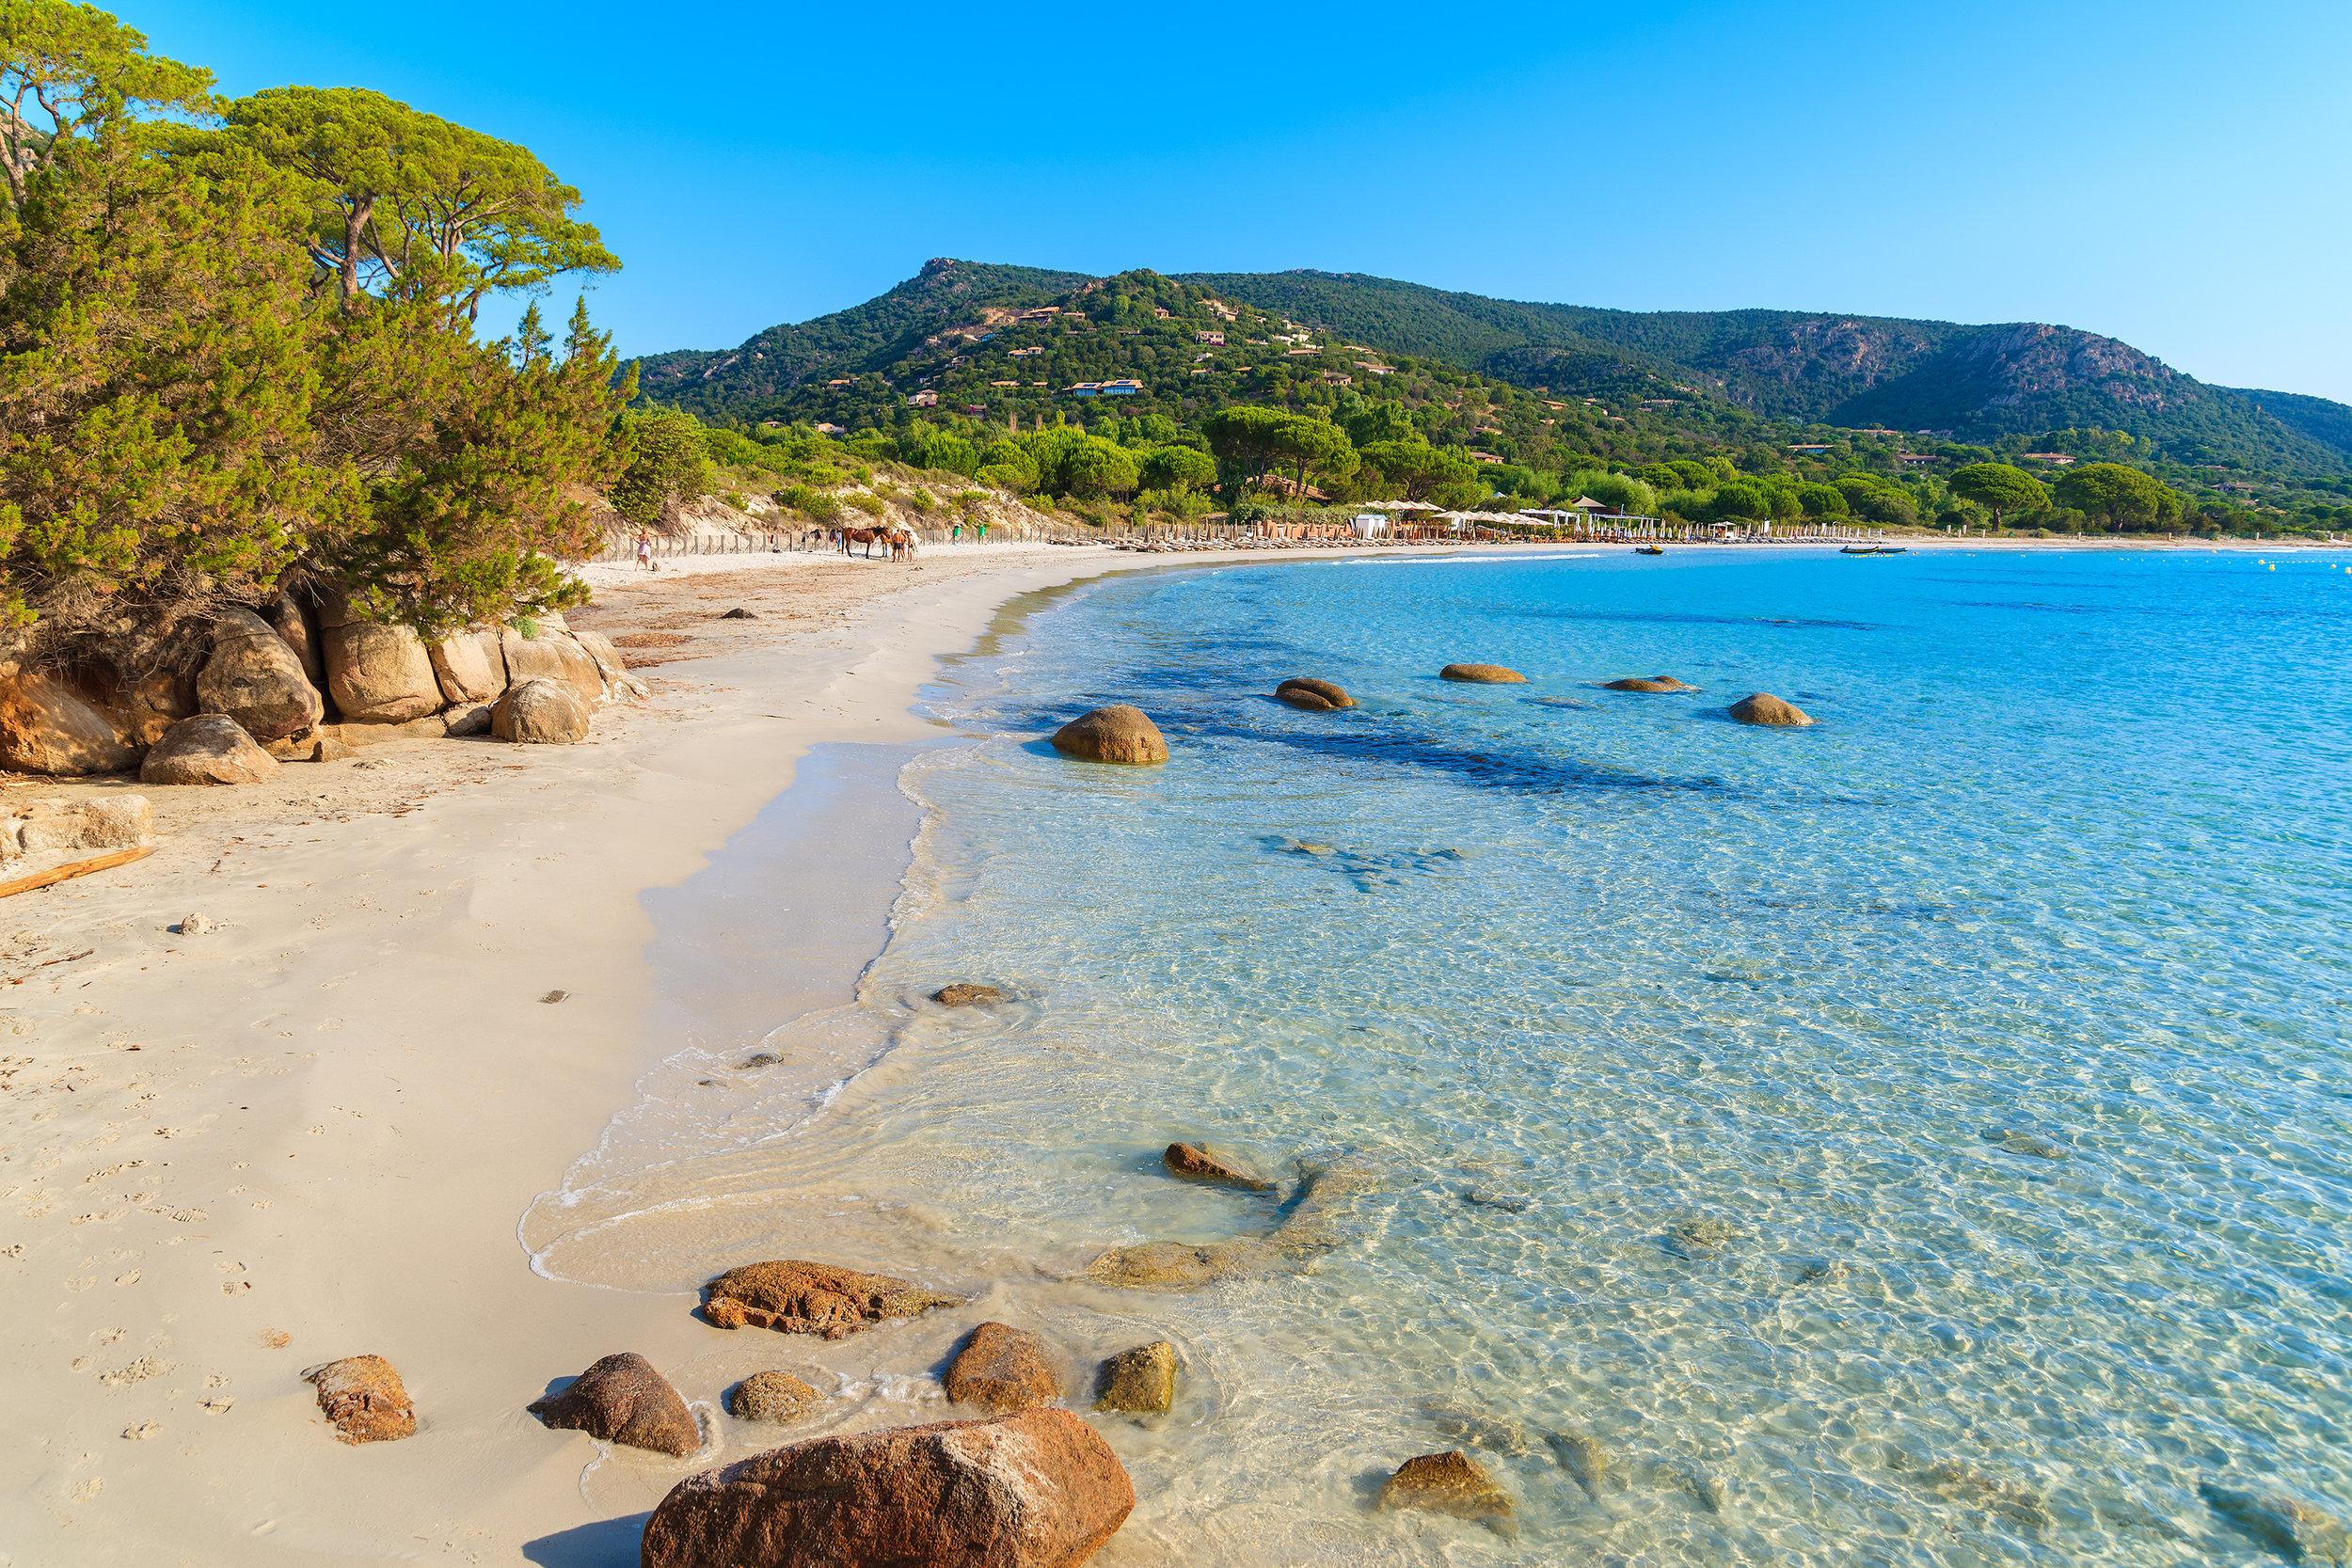 Crowded corsican beach